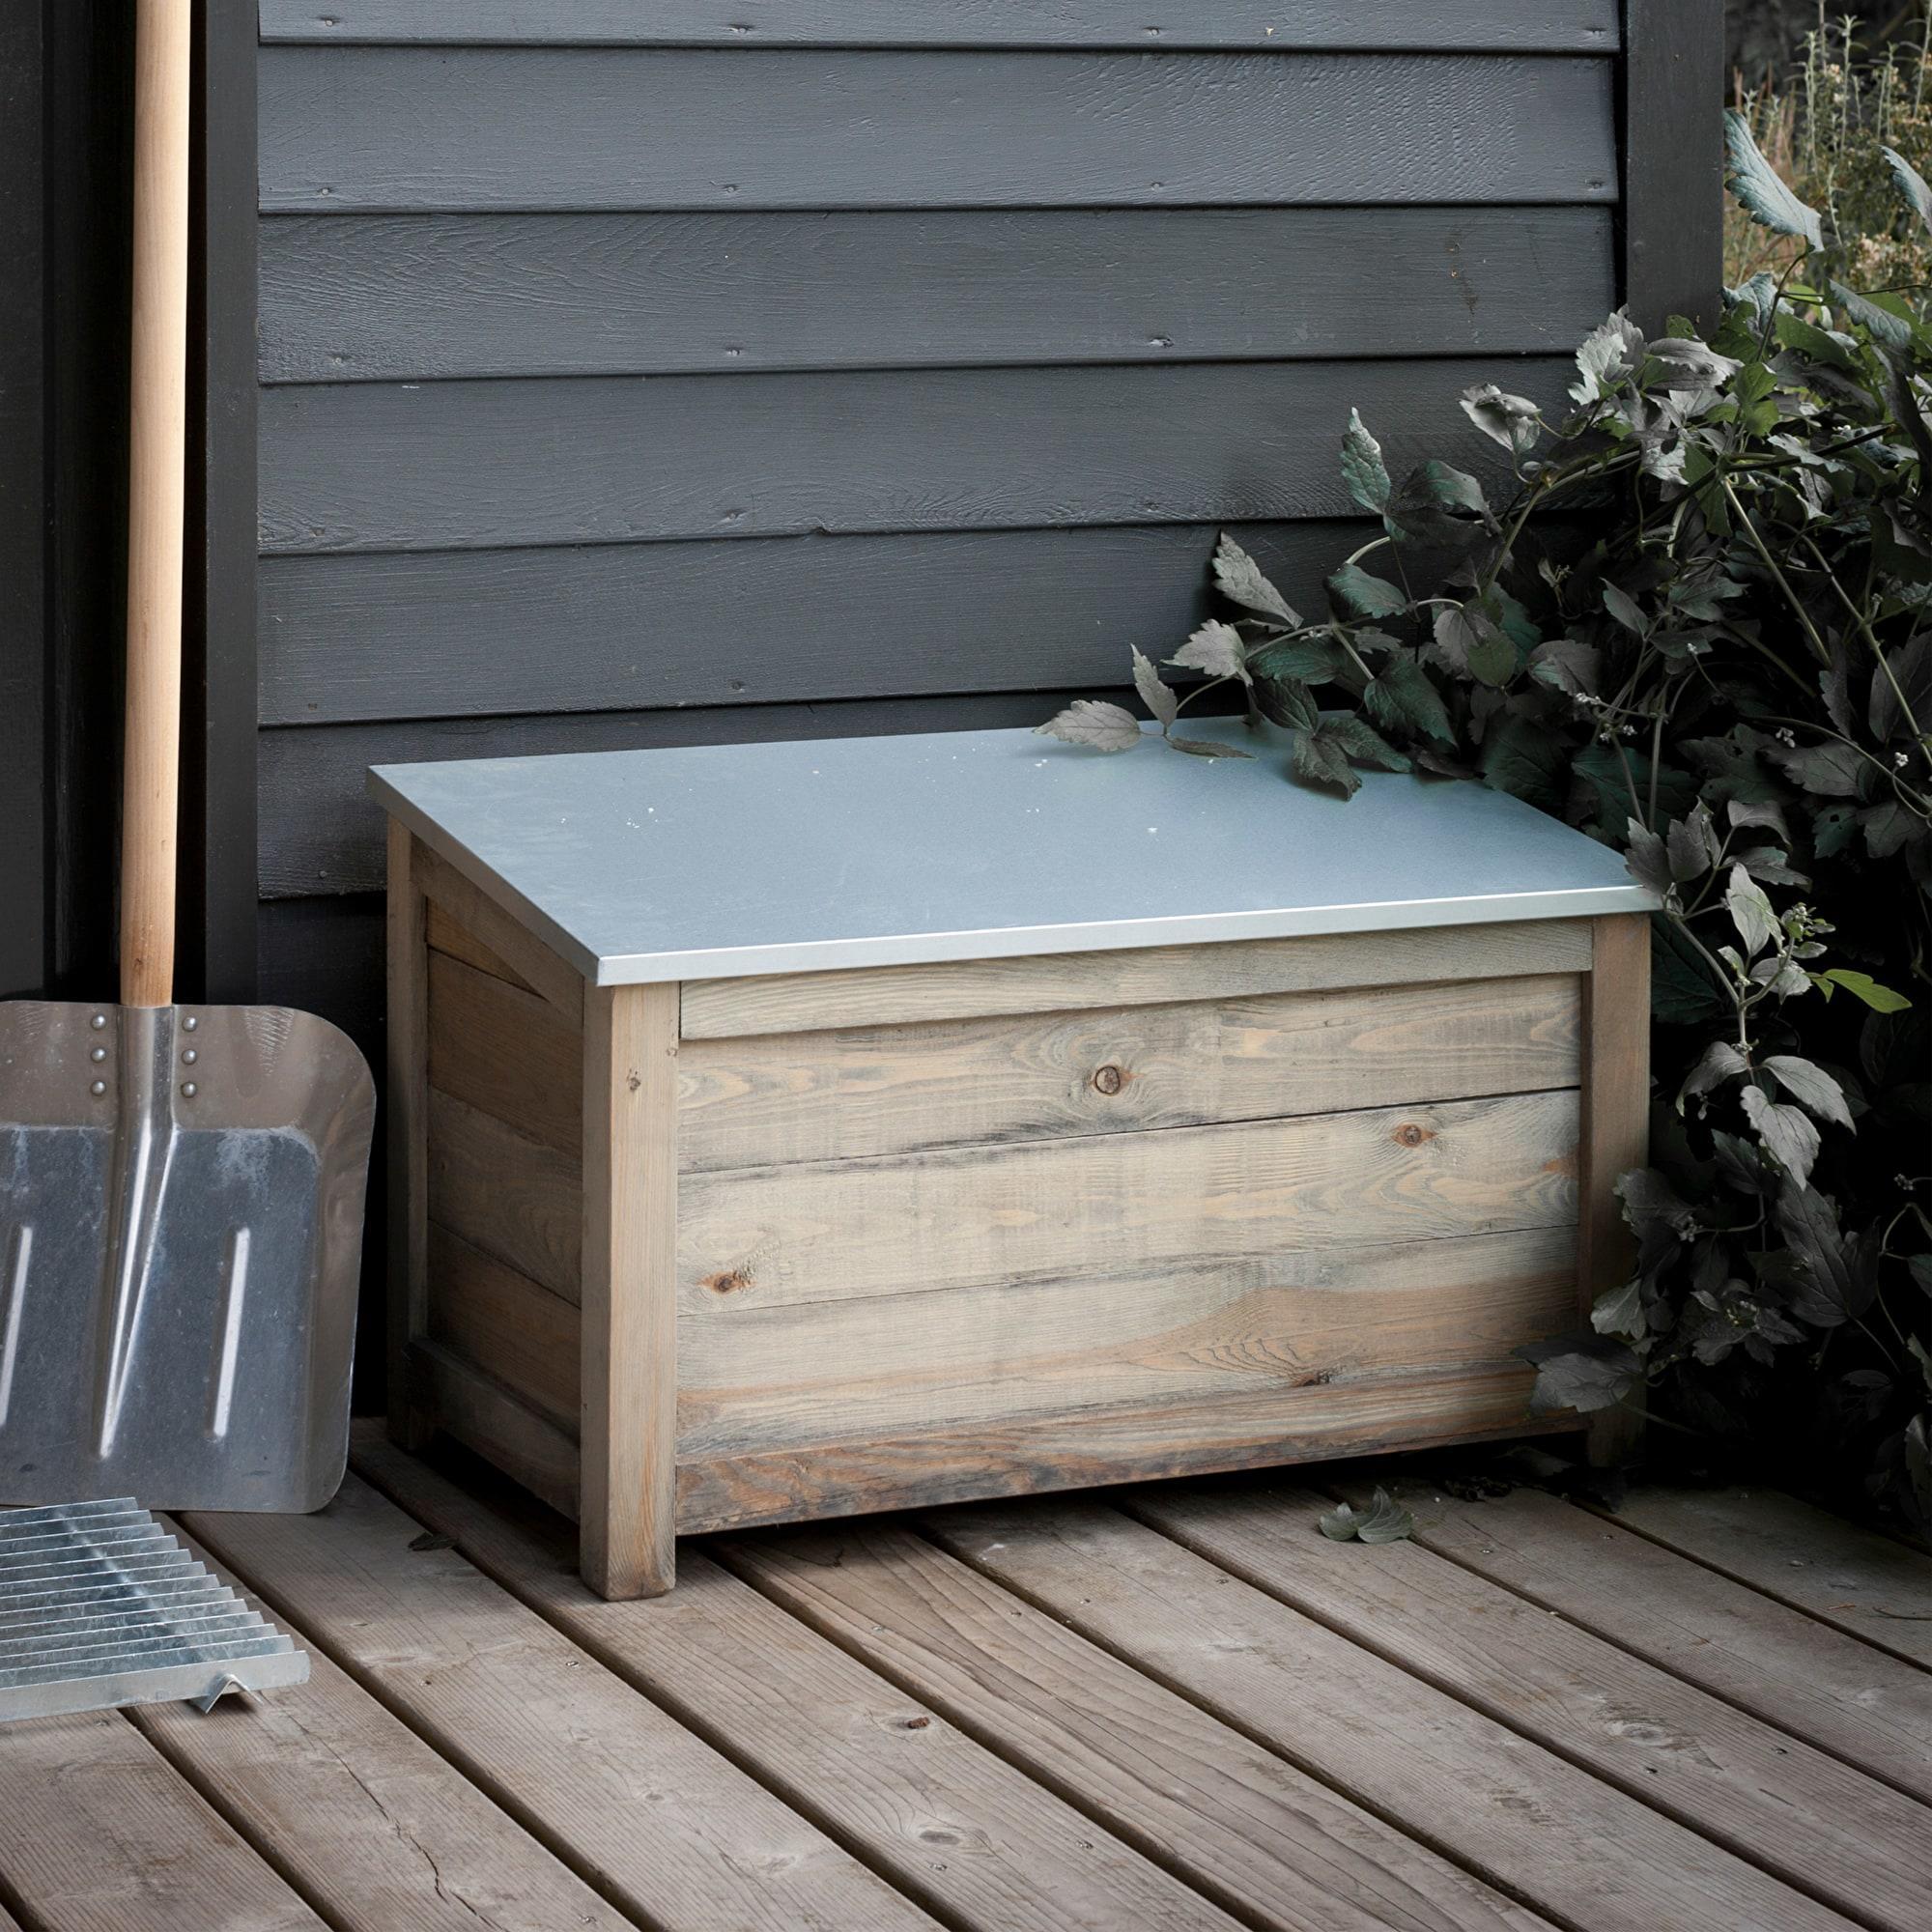 Outdoor Storage Box Garden Wood Spruce Weatherproof